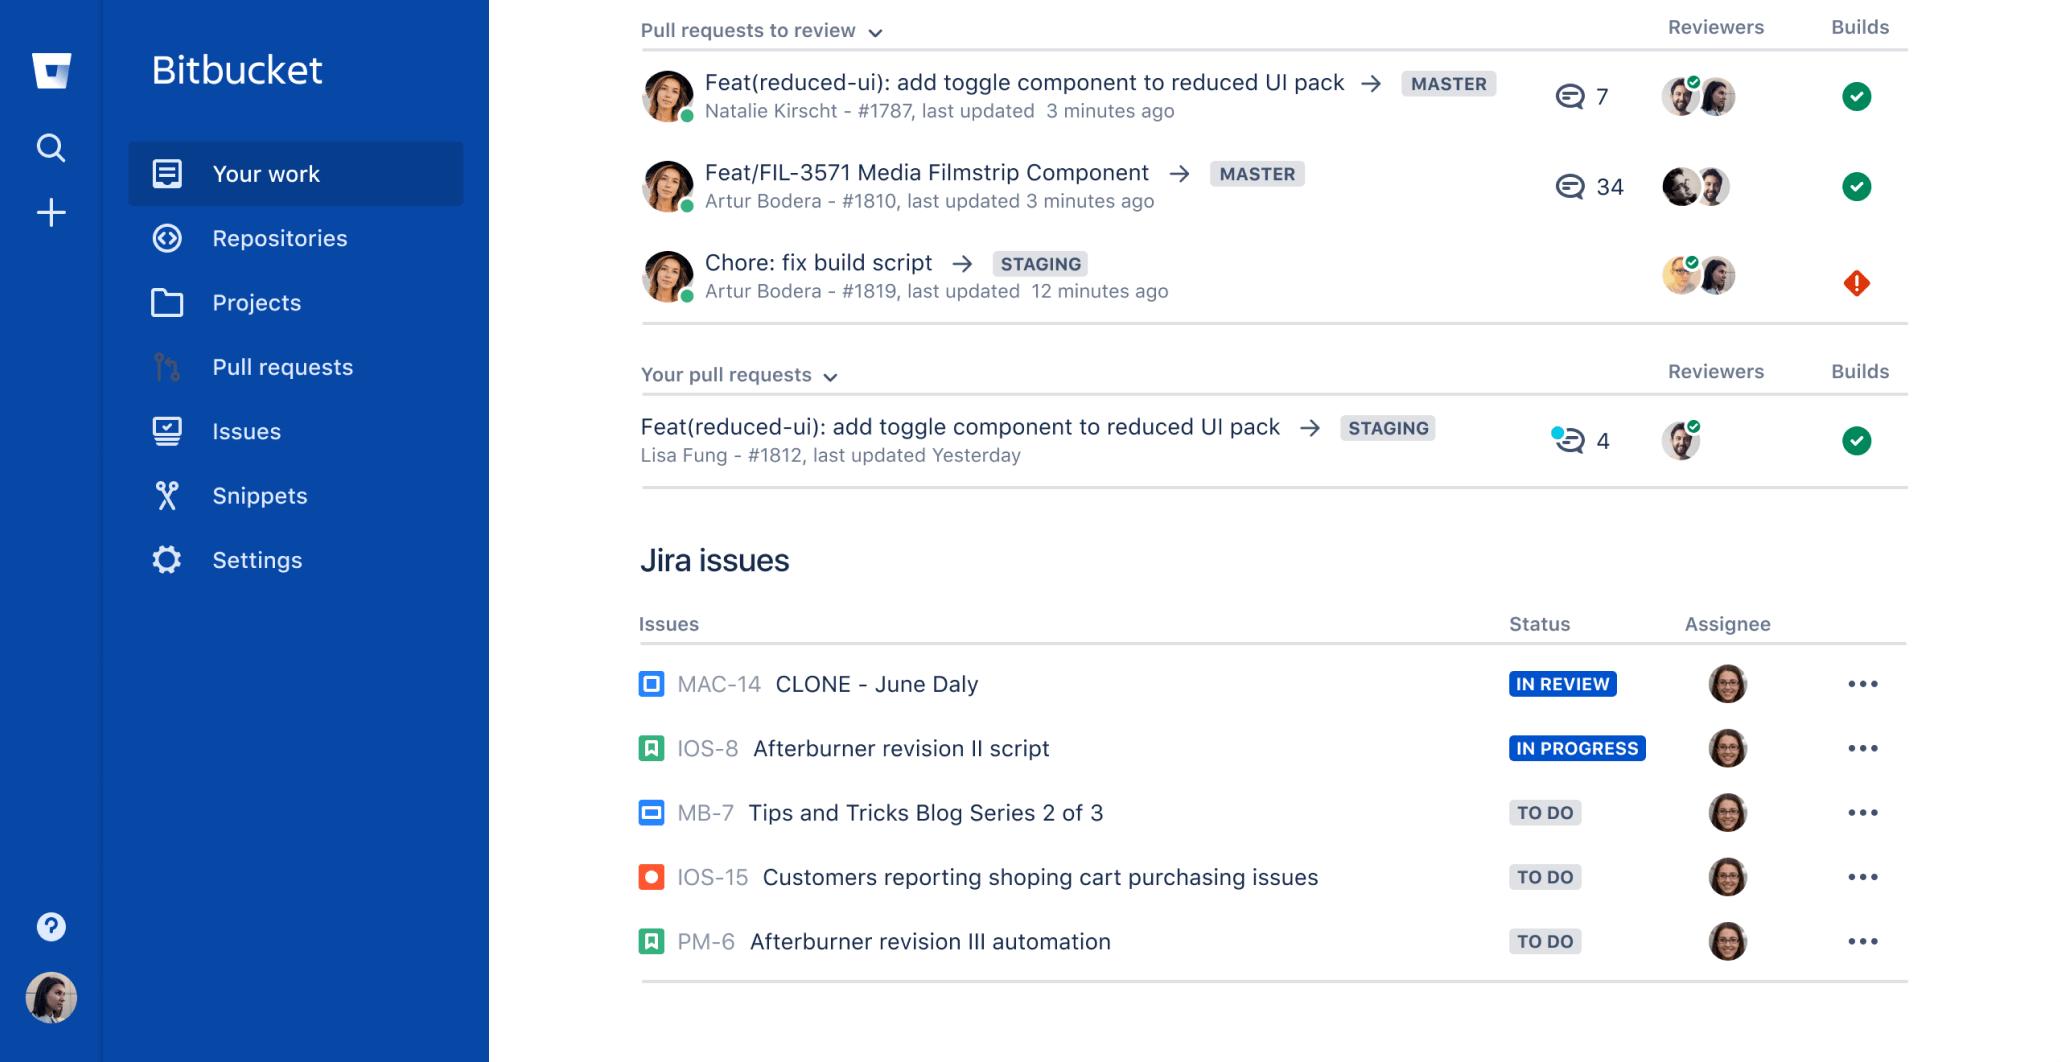 Bitbucket Dashboard Screenshot